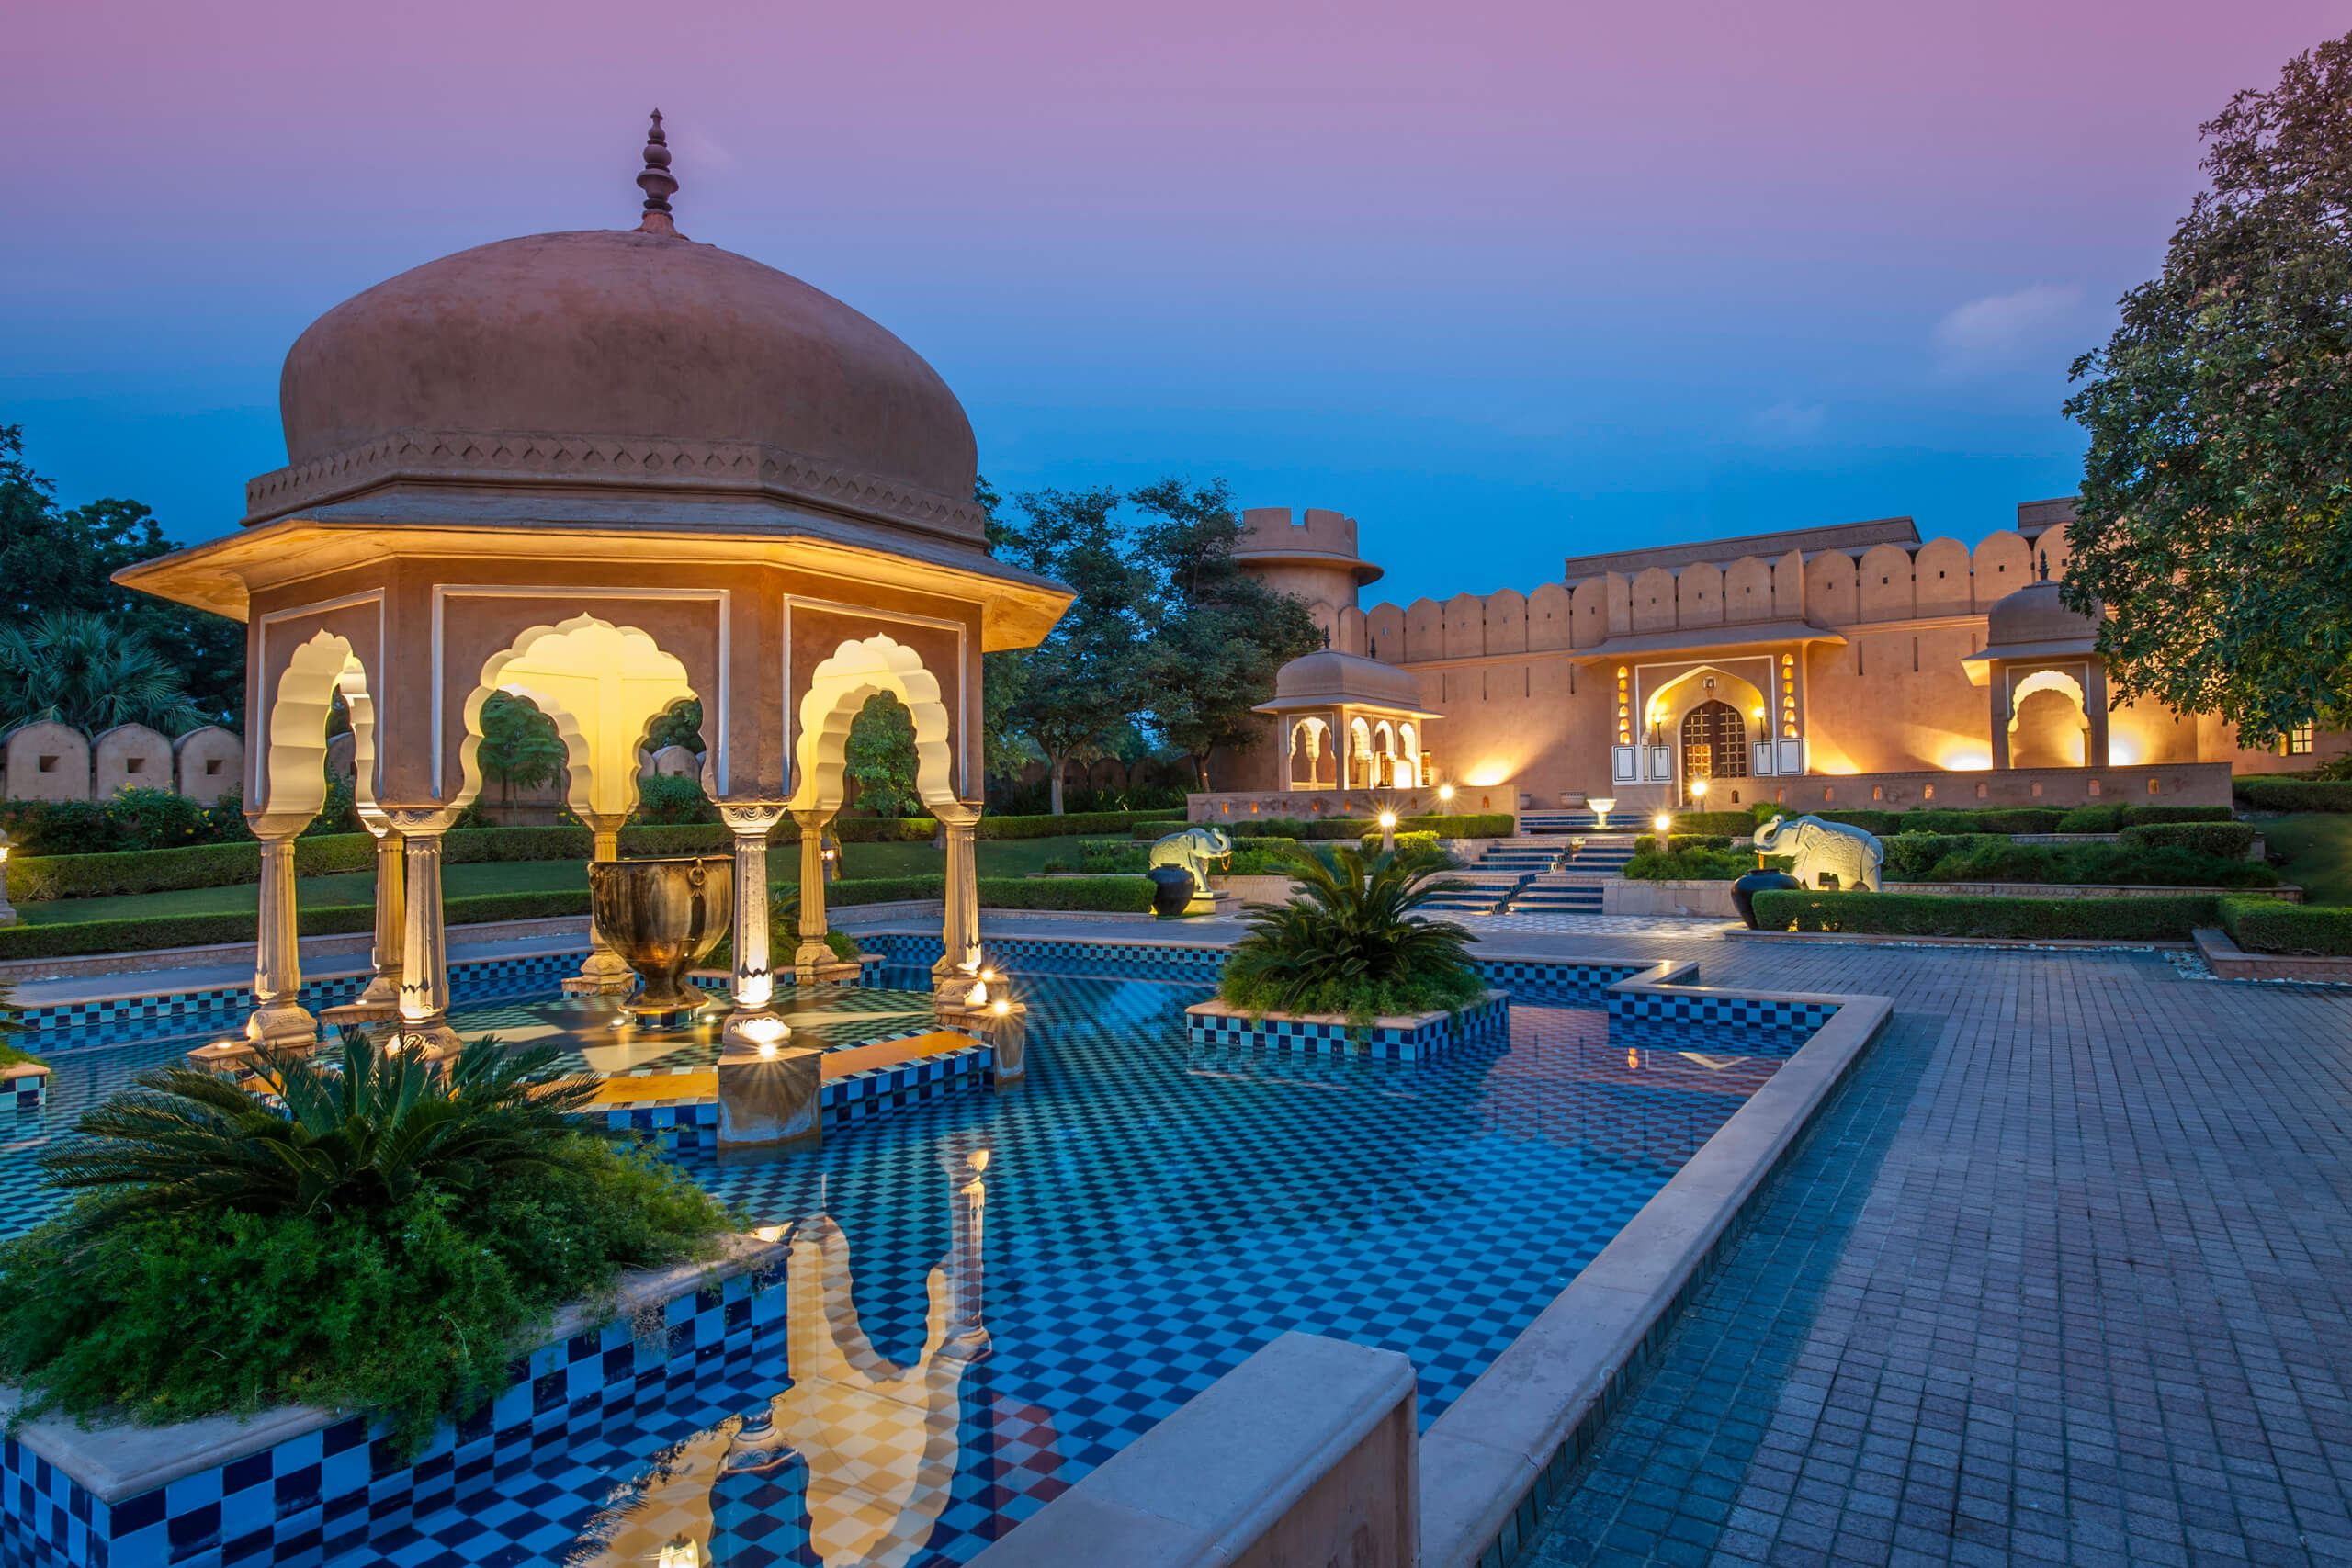 Oberoi Rajvilas Jaipur India by Michelle Chaplow